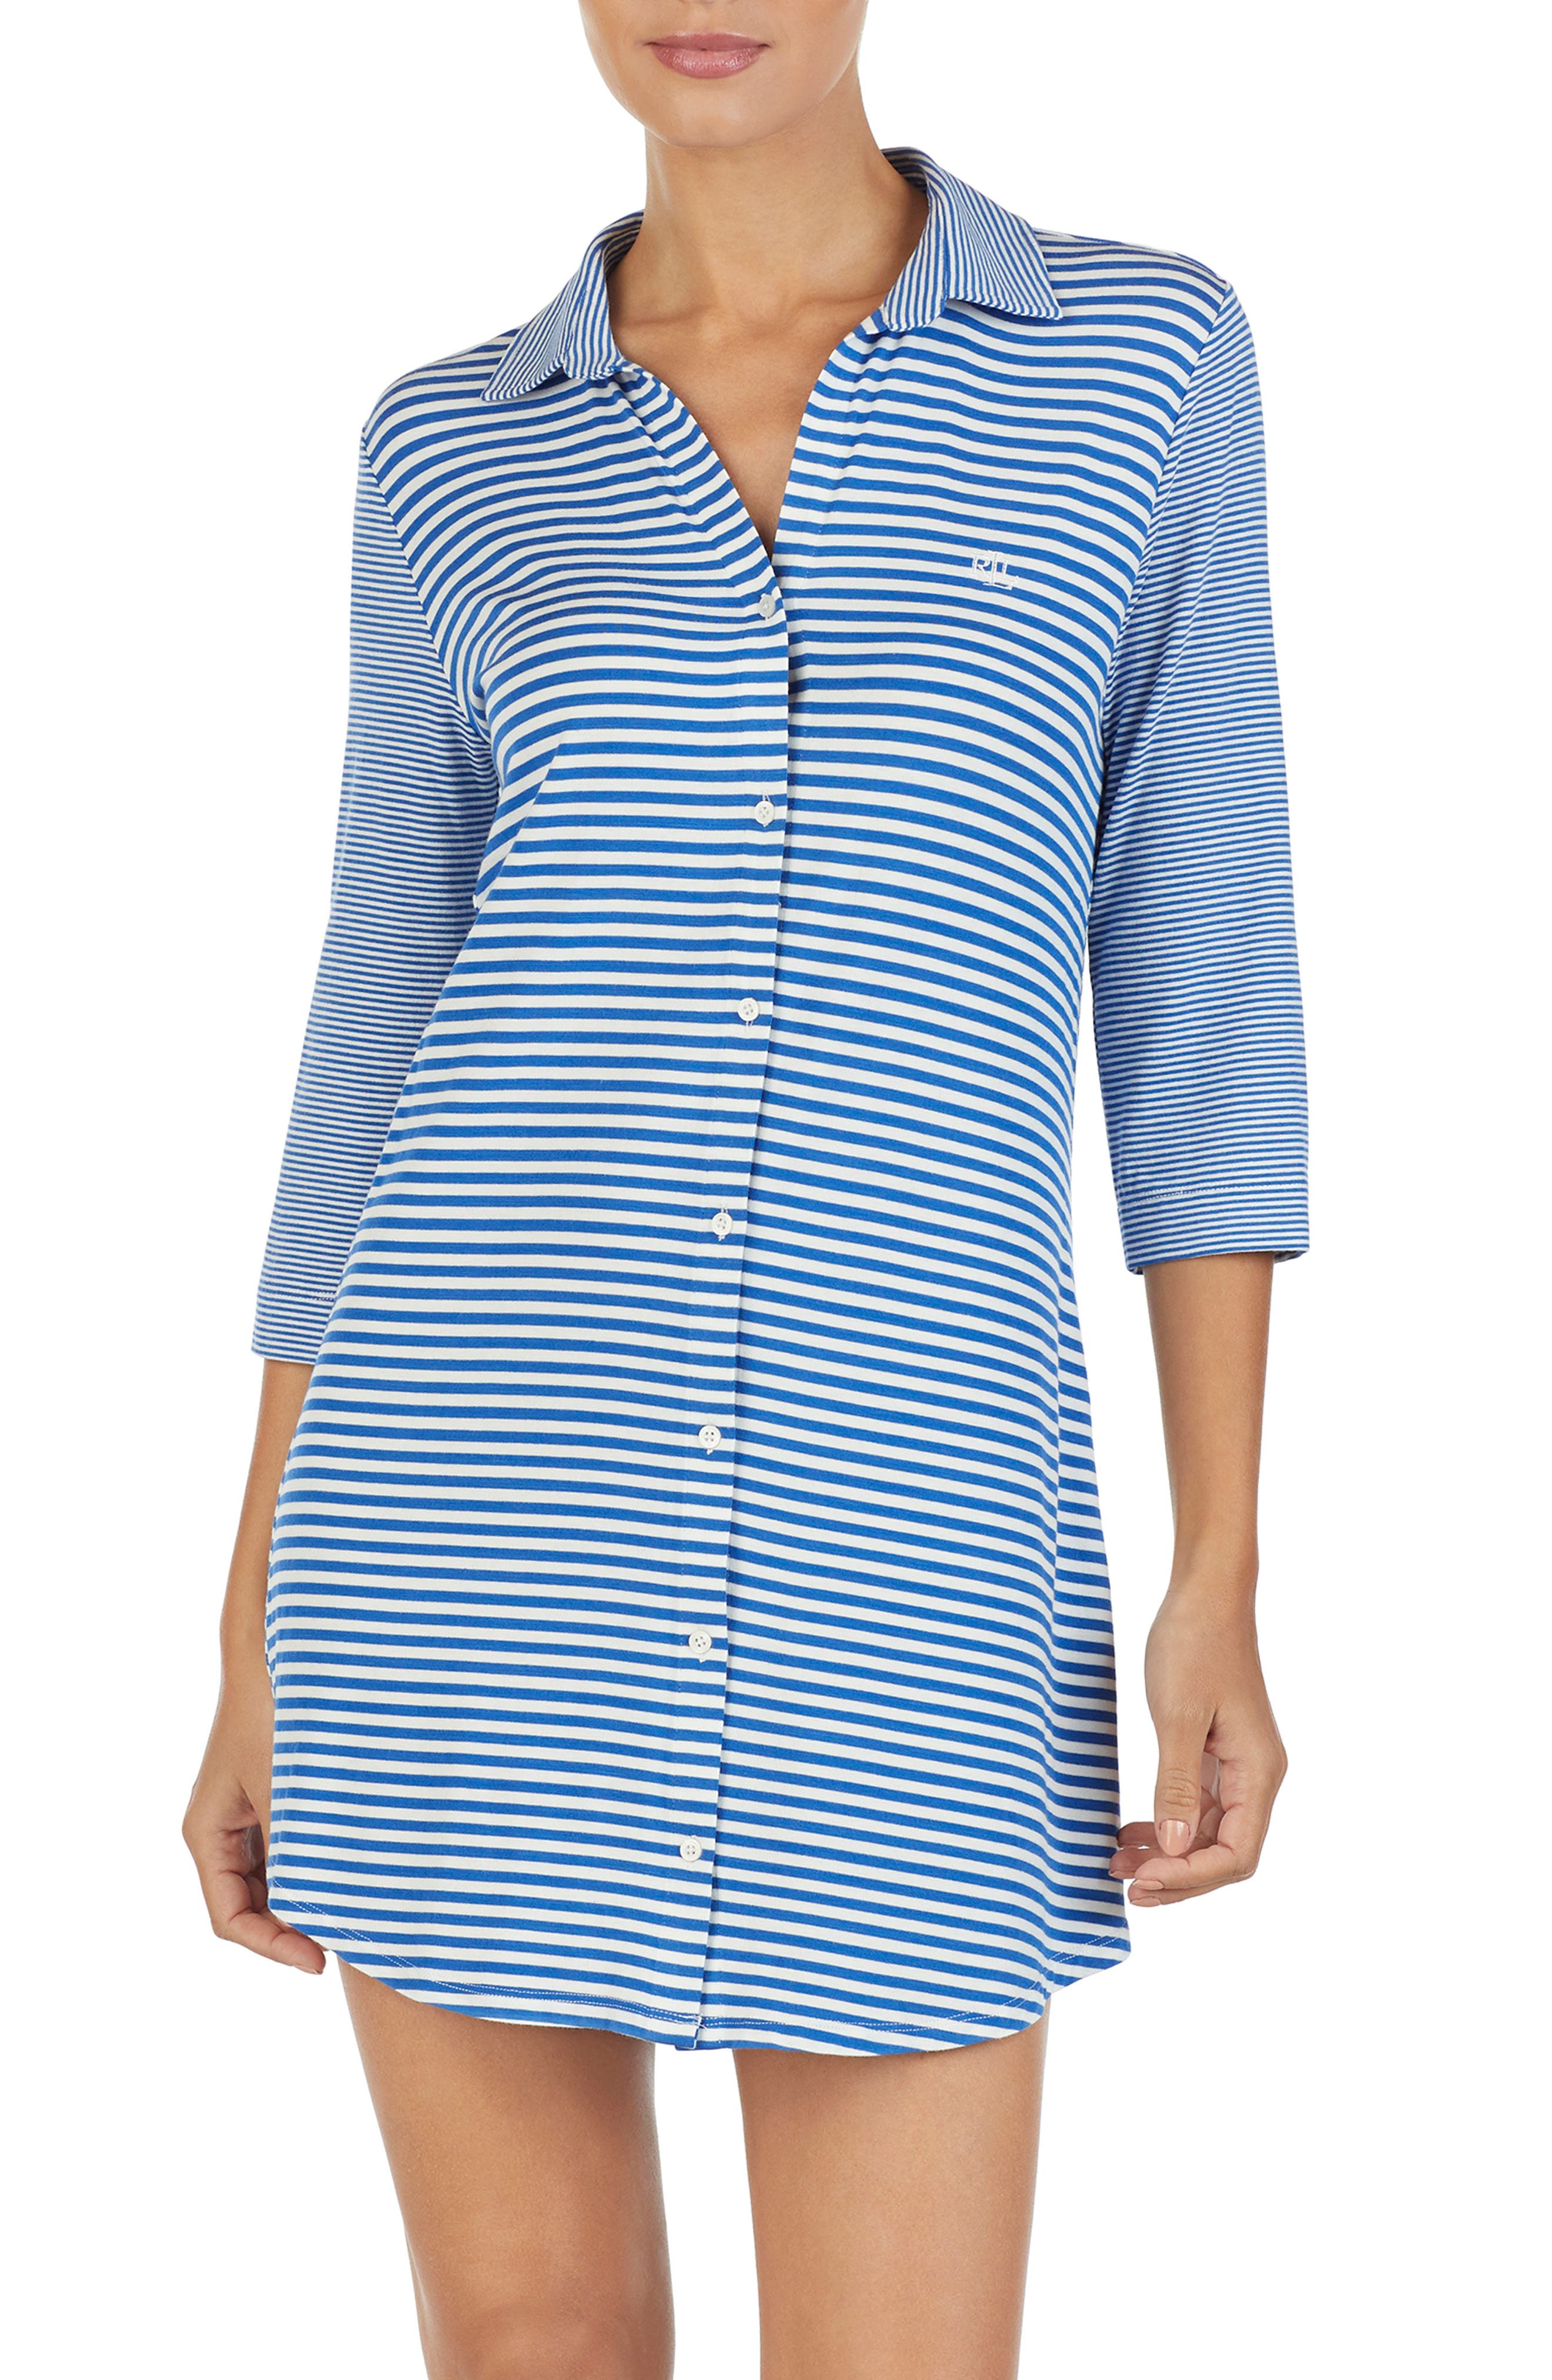 Stripe Sleep Shirt, Main, color, BLUE STRIPE